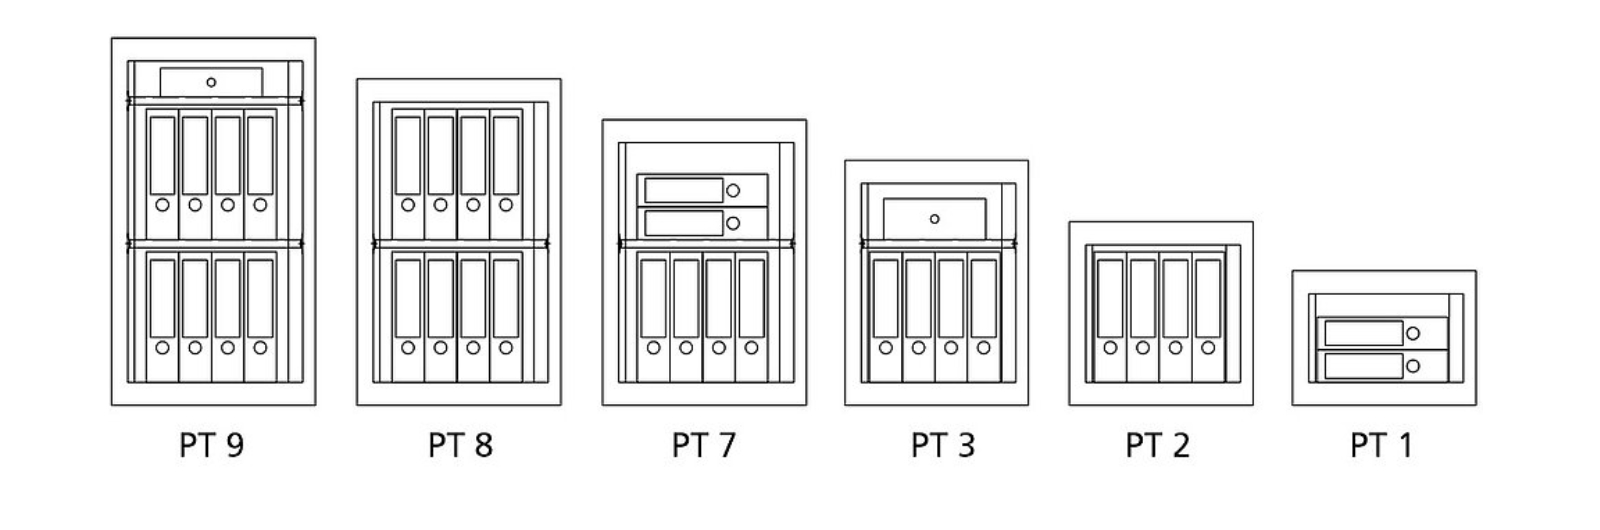 Tresor_PT-Varianten_800x800_20210421